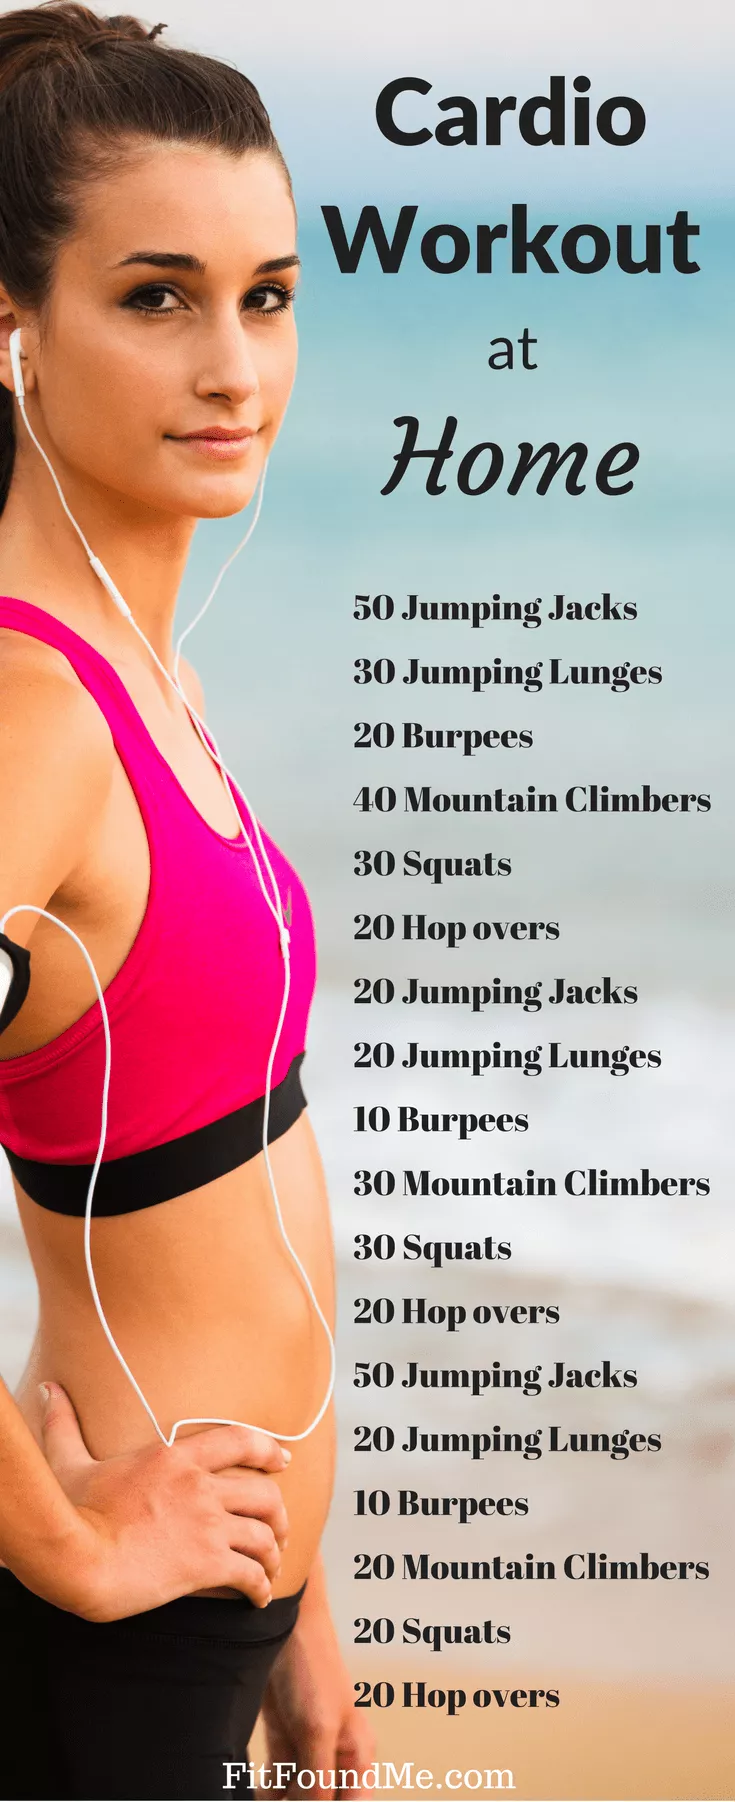 30 Minute Indoor No Equipment Cardio Workout for Women Over 40